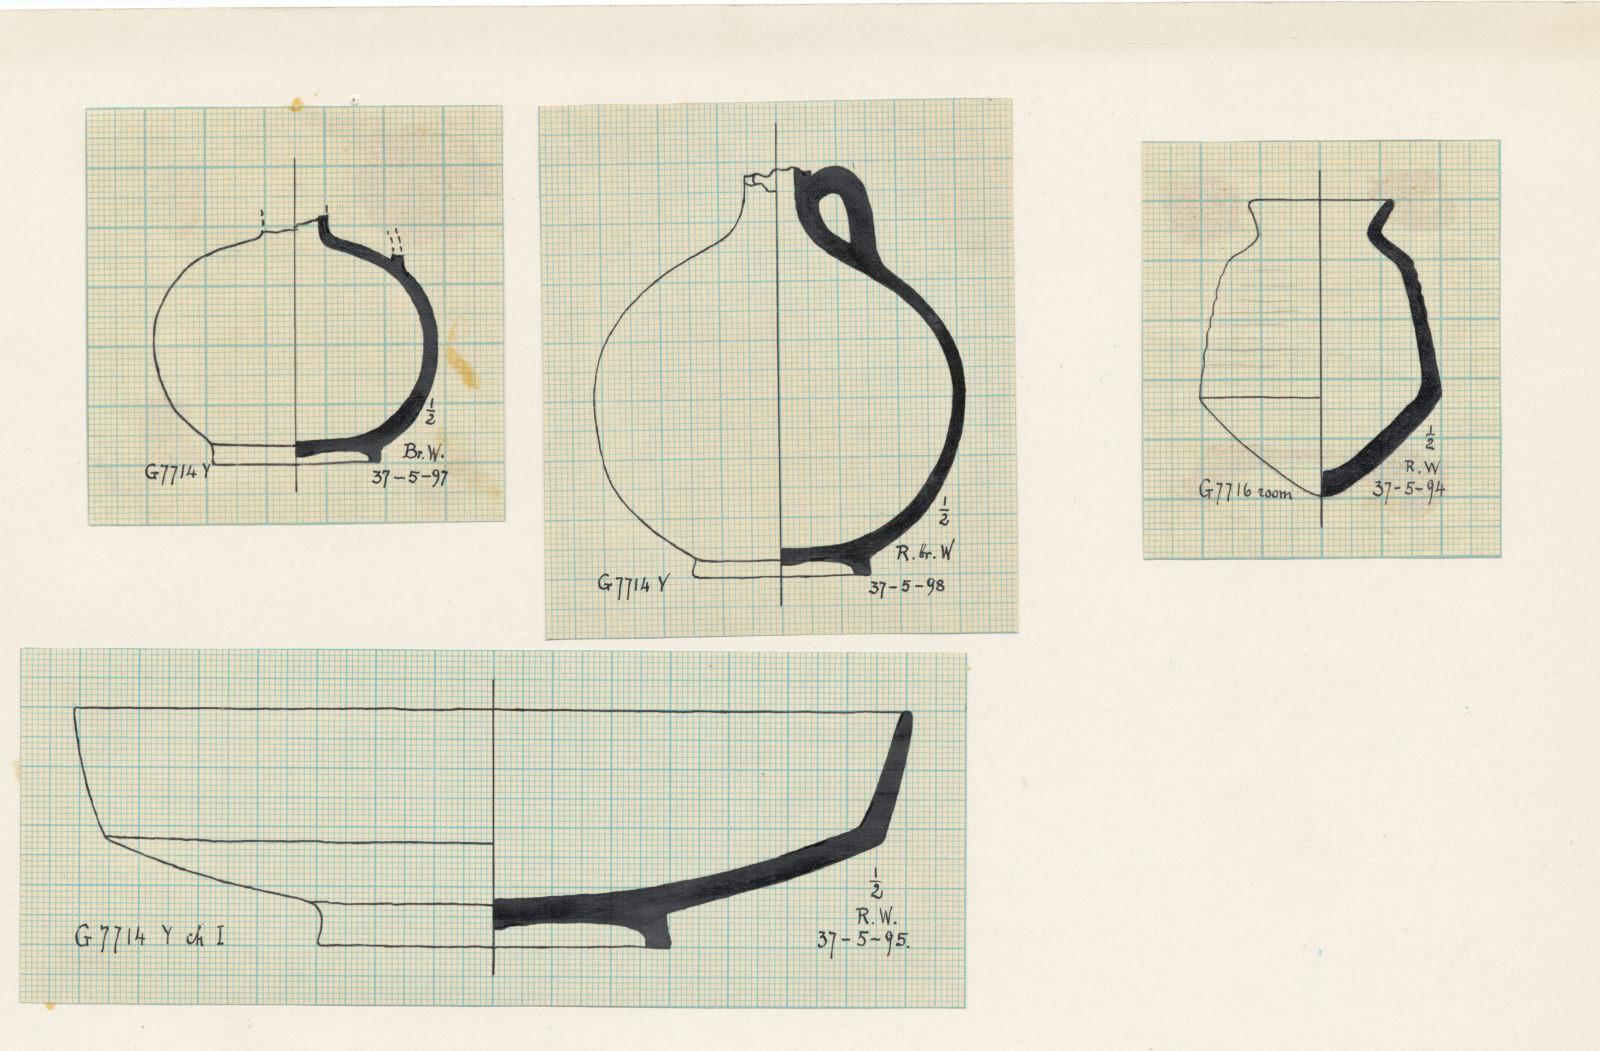 Drawings:  G 7714, Shaft Y: potttery